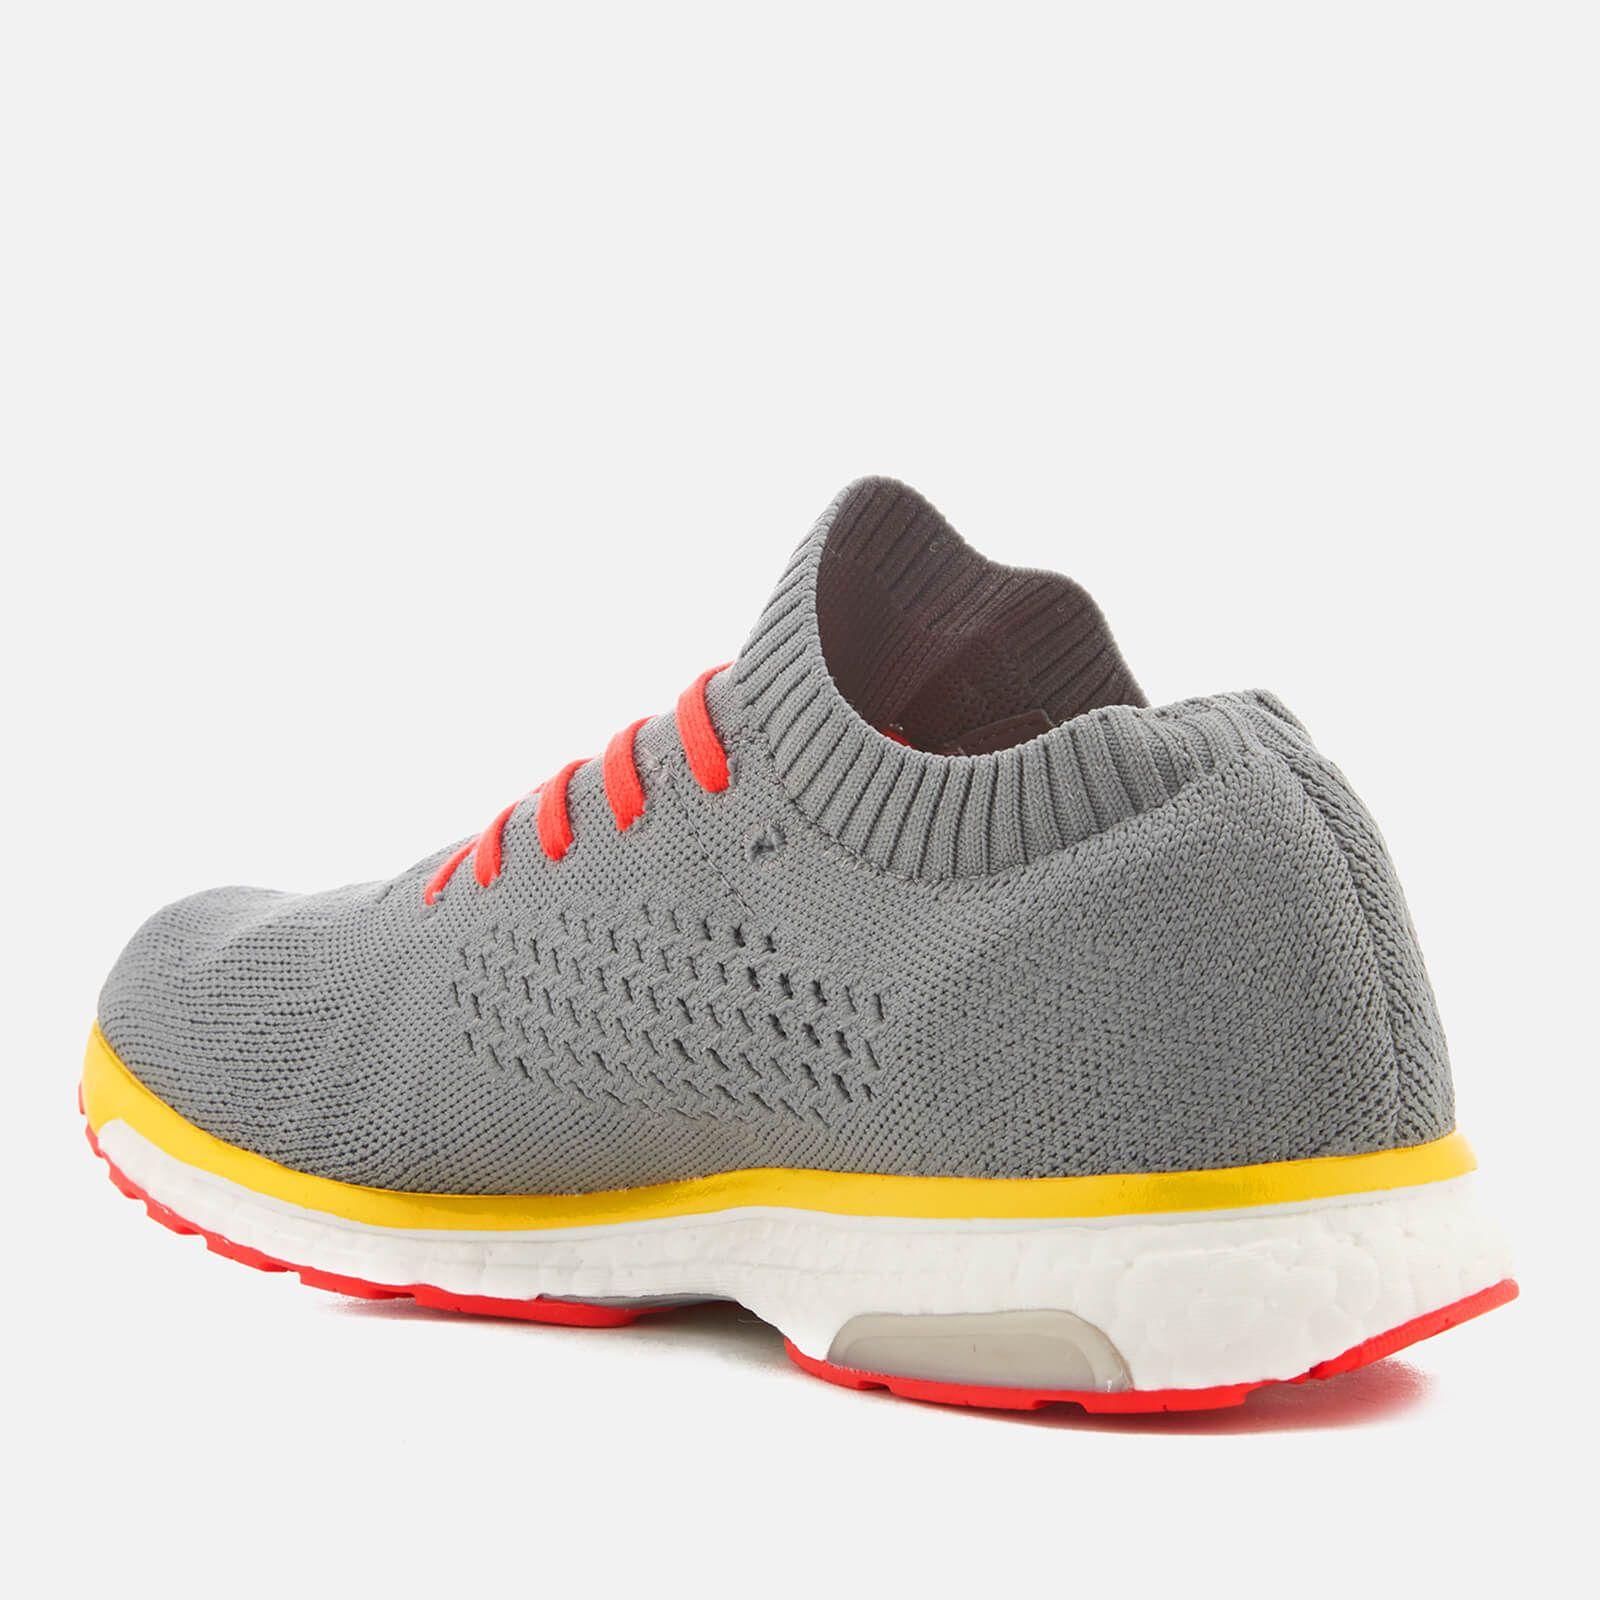 Grey|Black|Yellow Adidas adiZero Prime Boost KOLOR